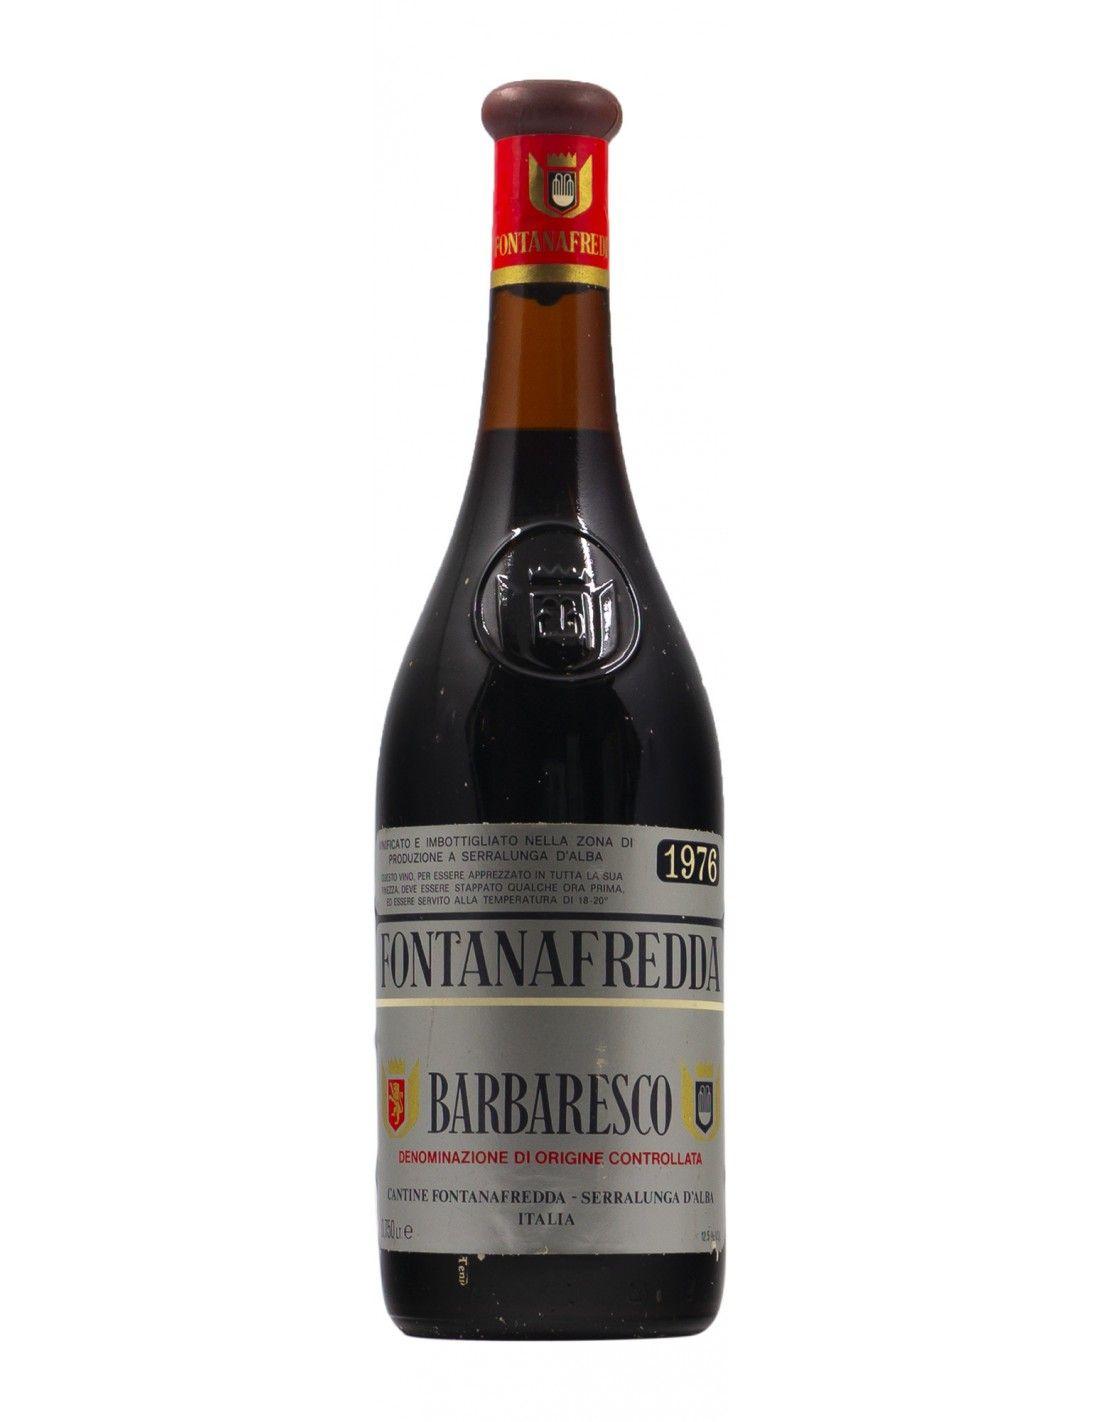 BAROLO 1976 FONTANAFREDDA Grandi Bottiglie